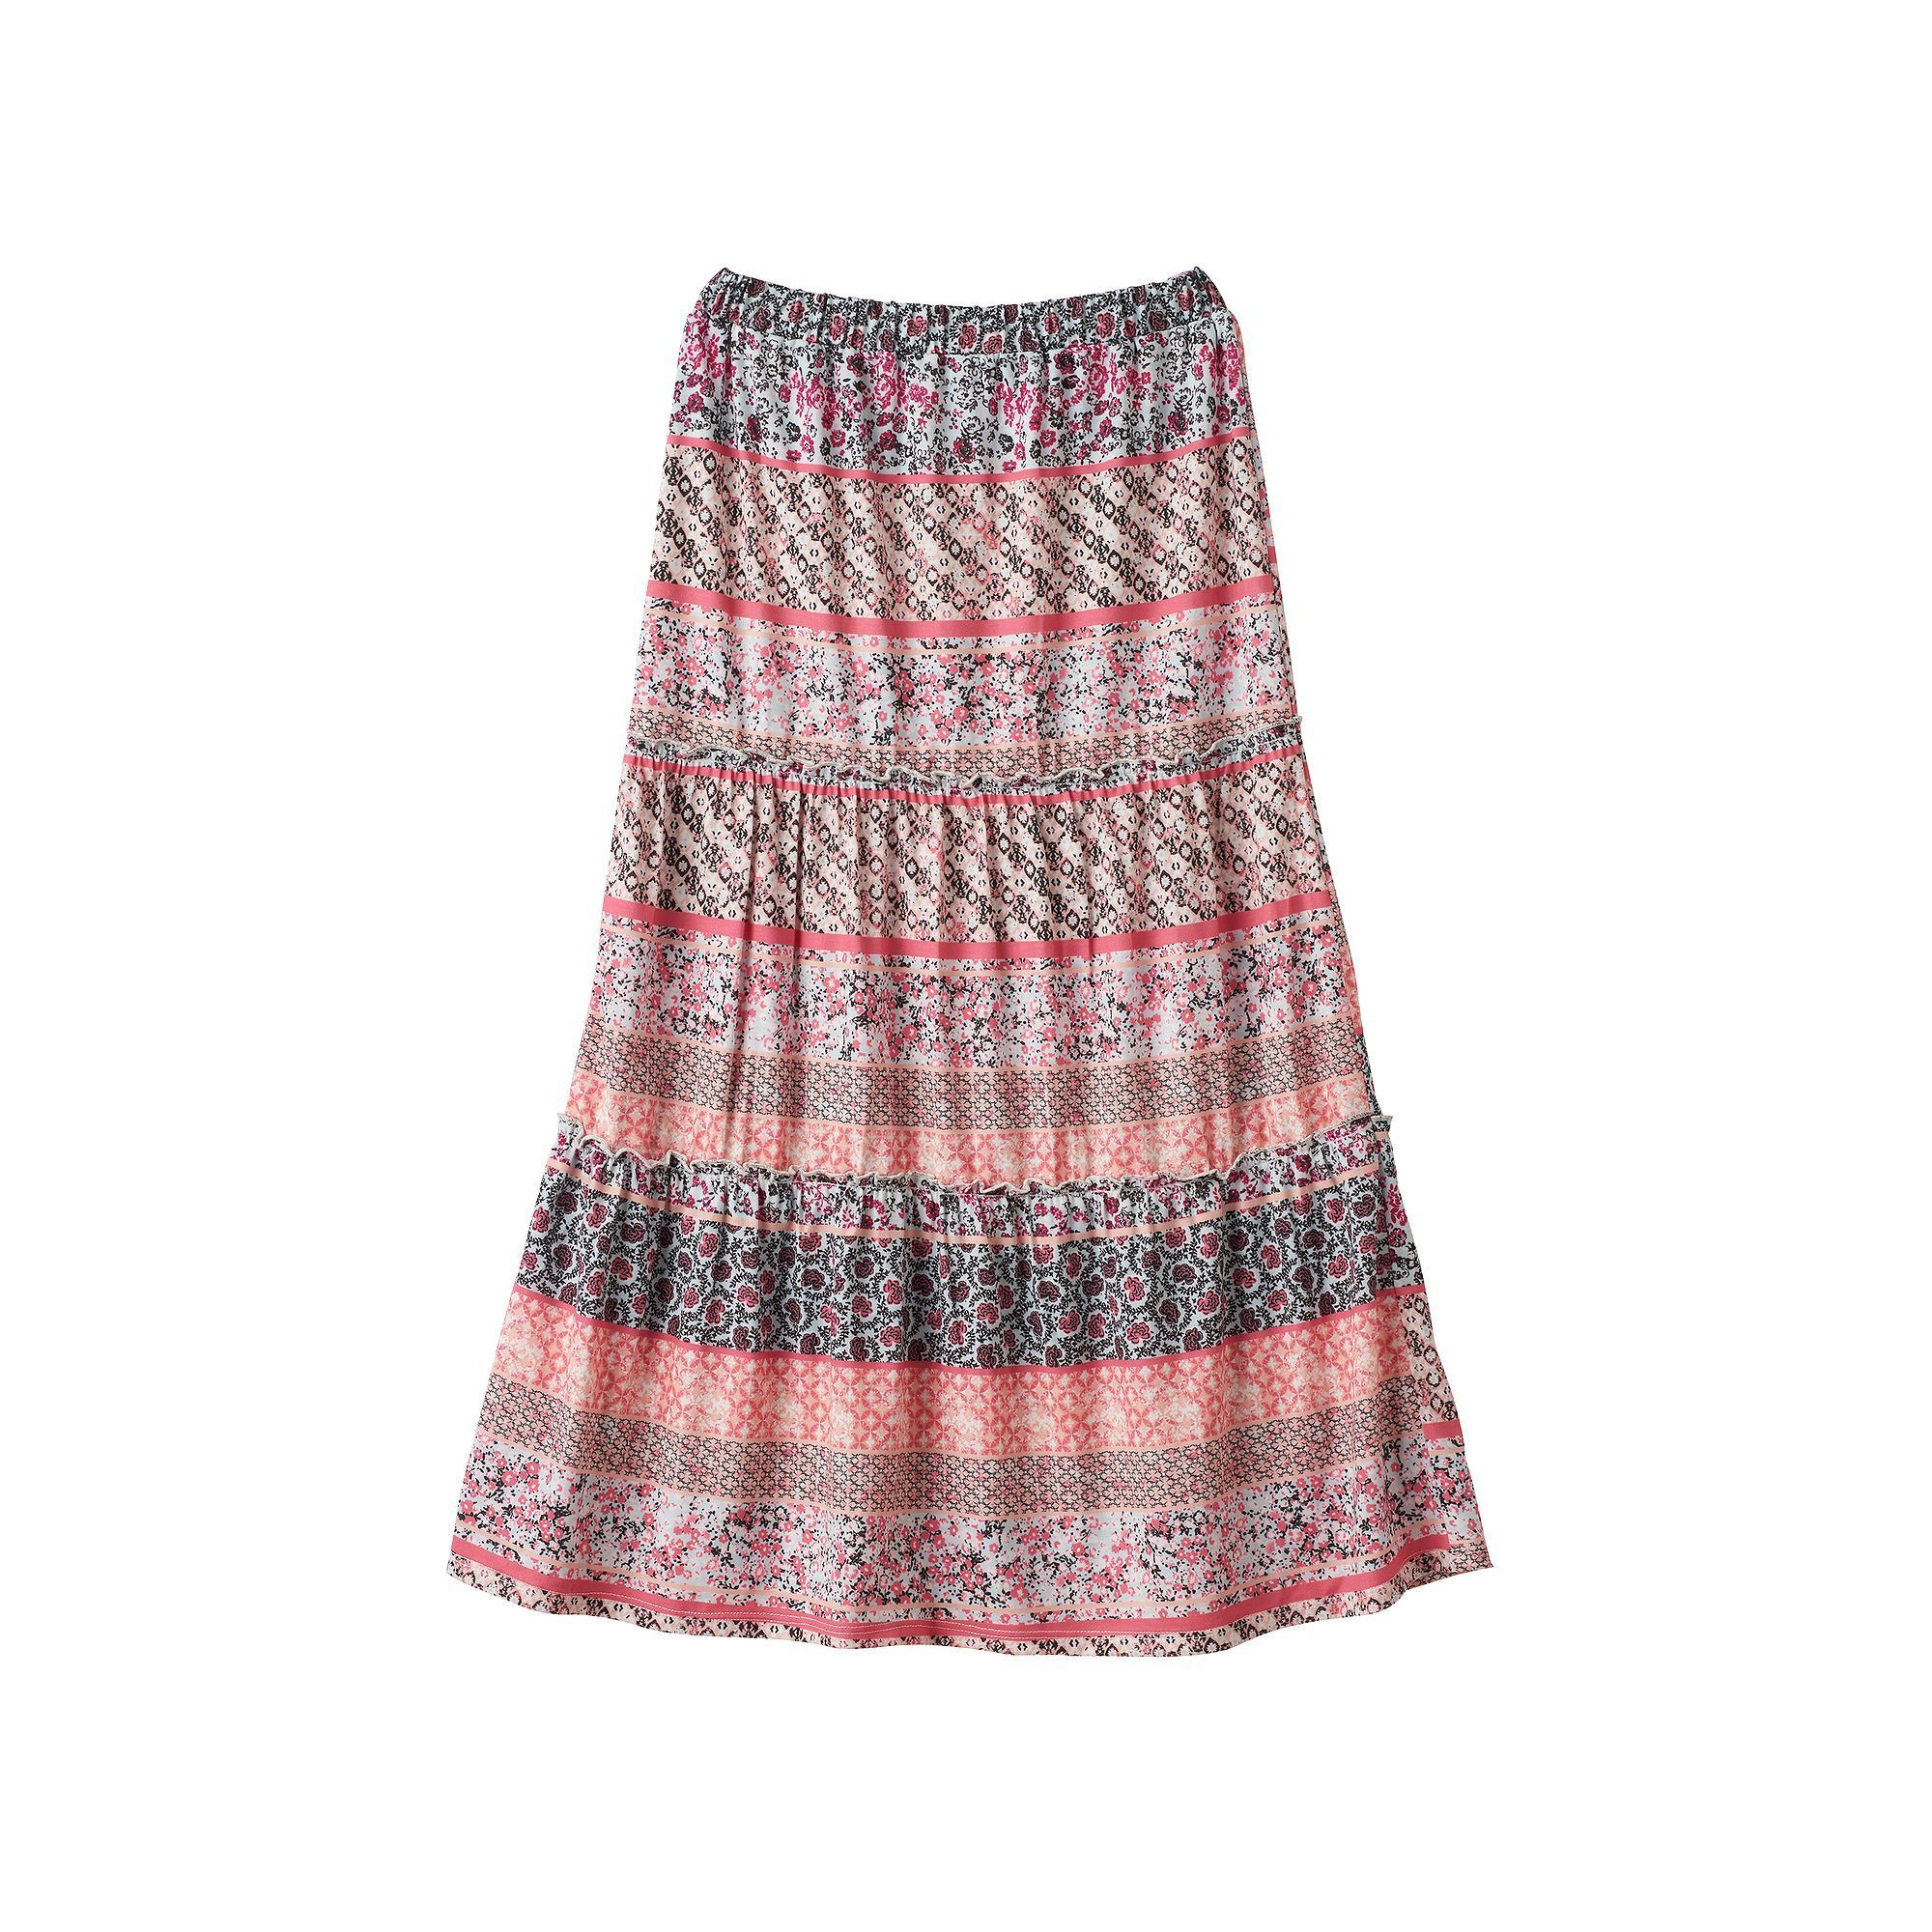 7aee162a19 Ladies Maxi Skirts Size 16 | Huston Fislar Photography